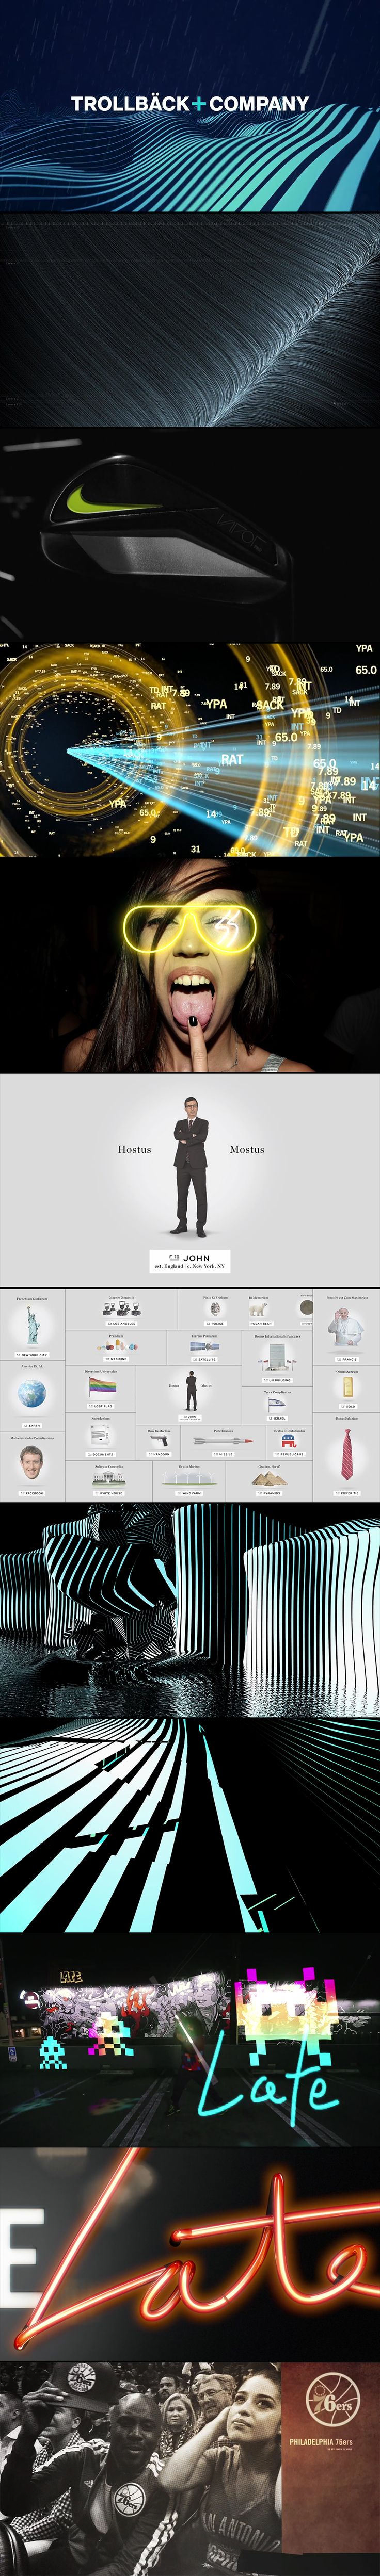 Trollbäck + Company: Motion Graphics update - cherryhill                                                                                                                                                     More